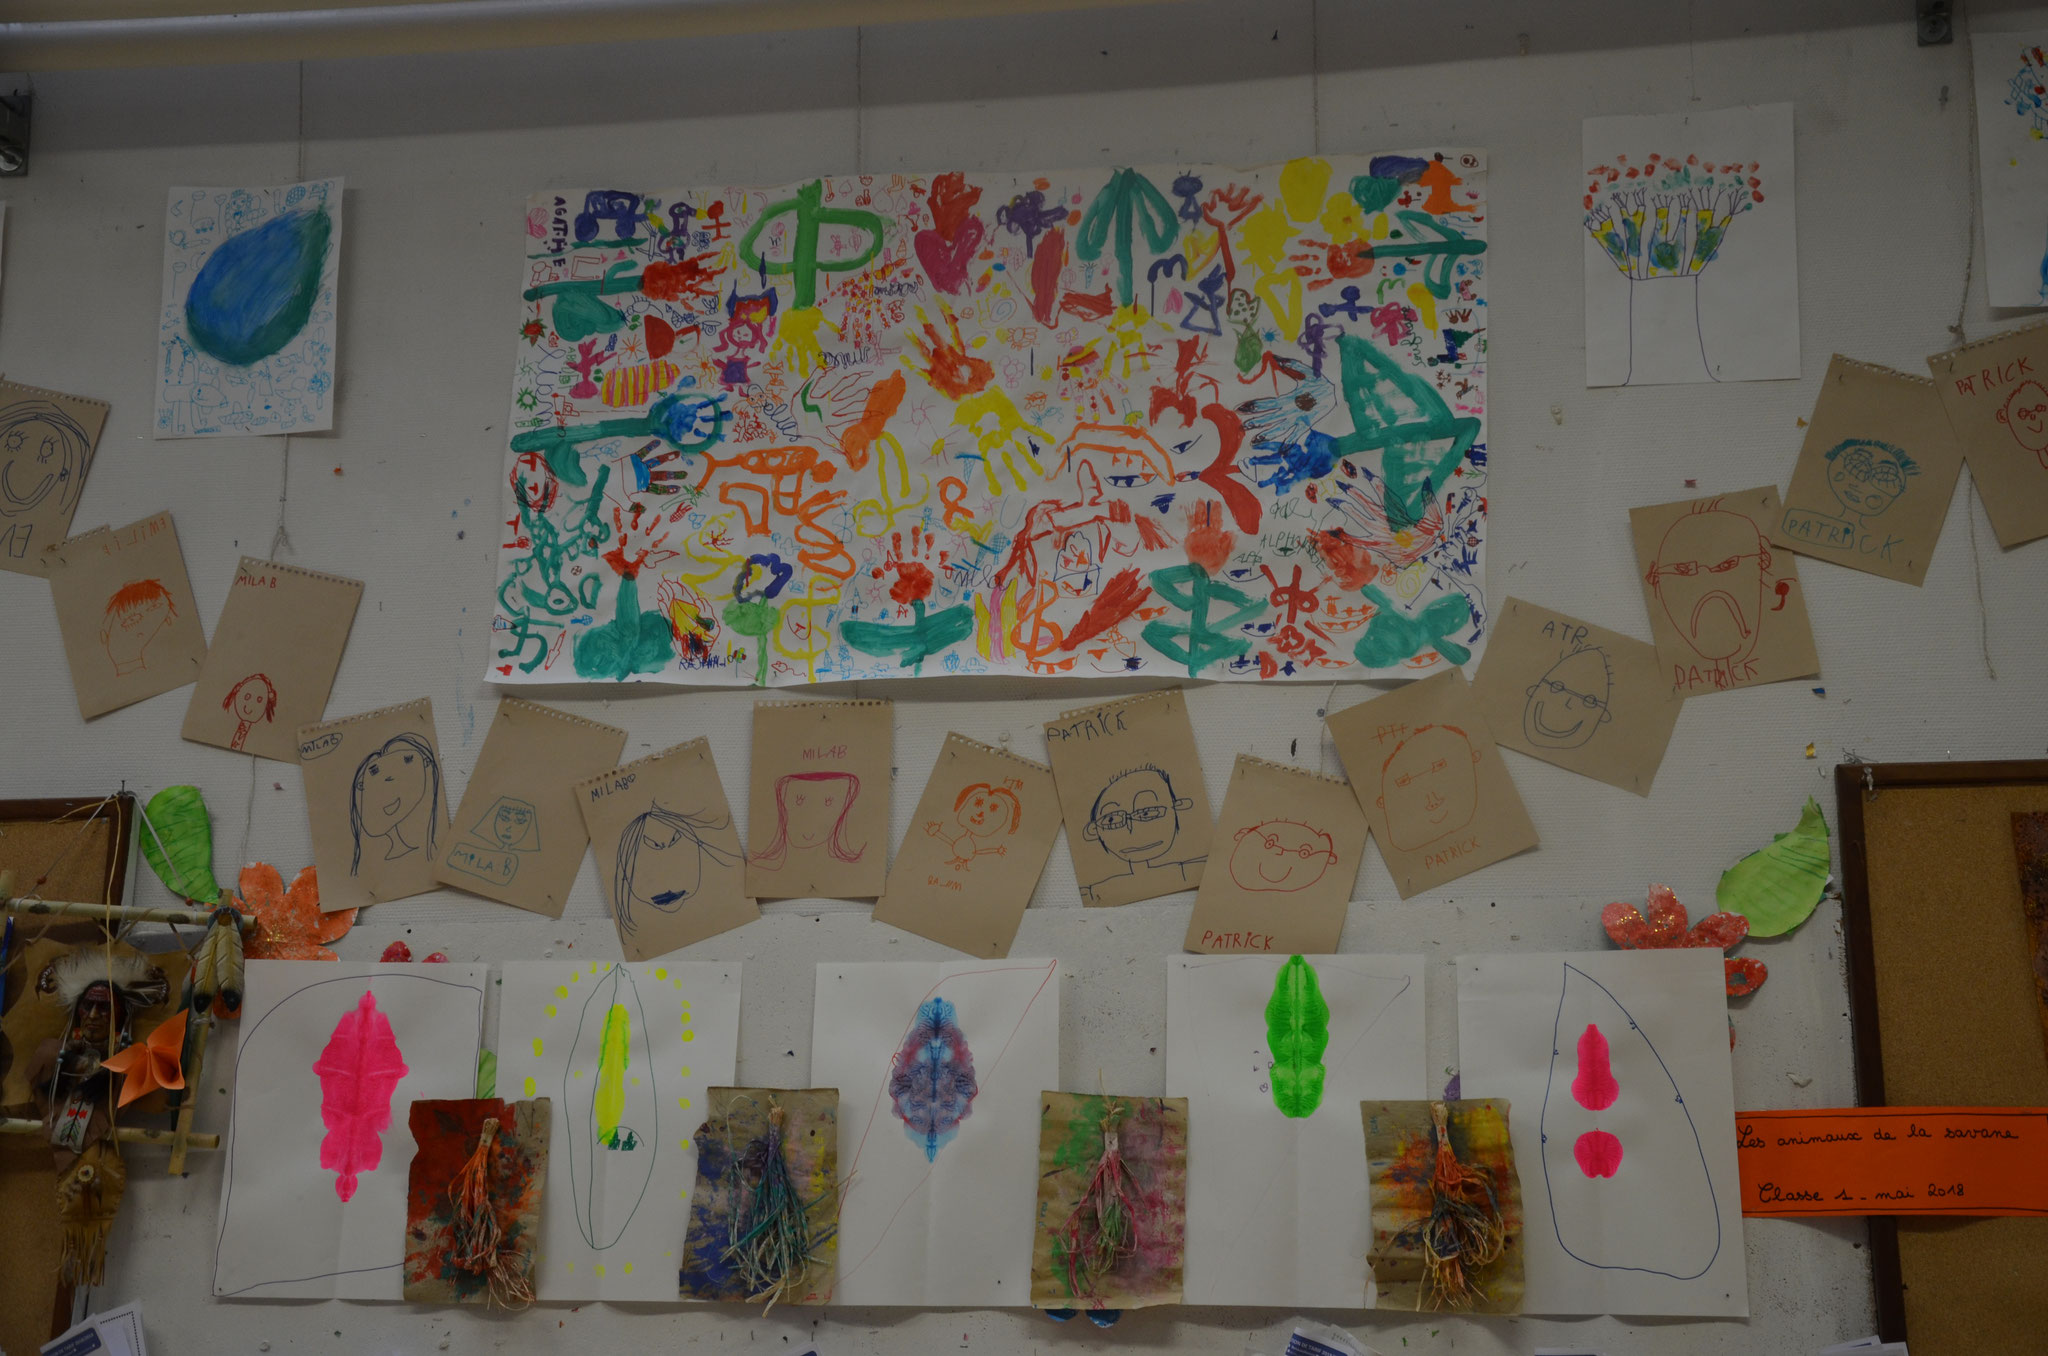 Portraits, Petits extra-terrestres et La fresque colorée